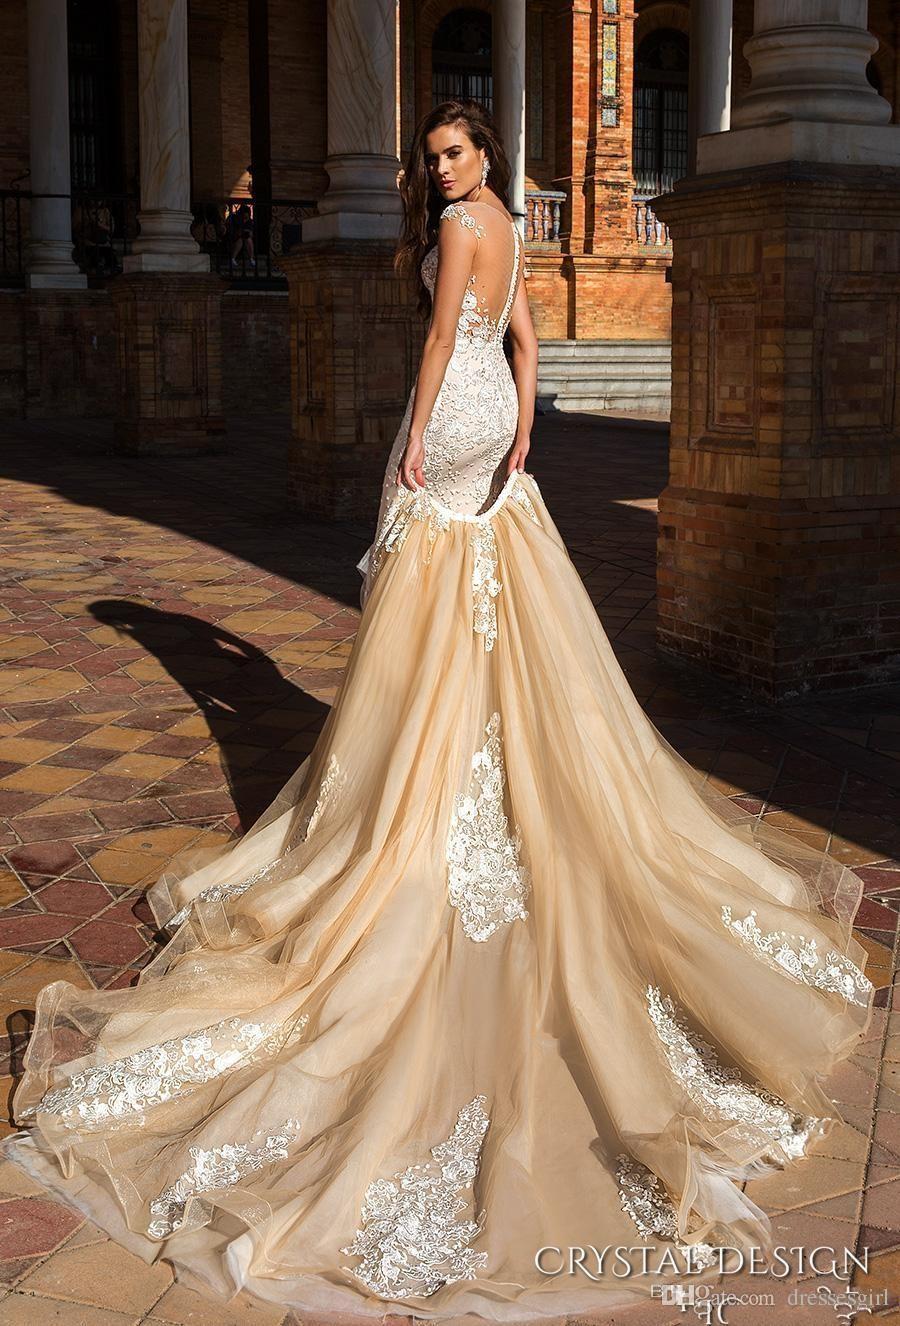 Crystal Design Bridal Capped Sleeve Jewel Neck Heavily Embroidered Bodice Detachable Skirt Sheath Wedding Dresses Low Back Long Train